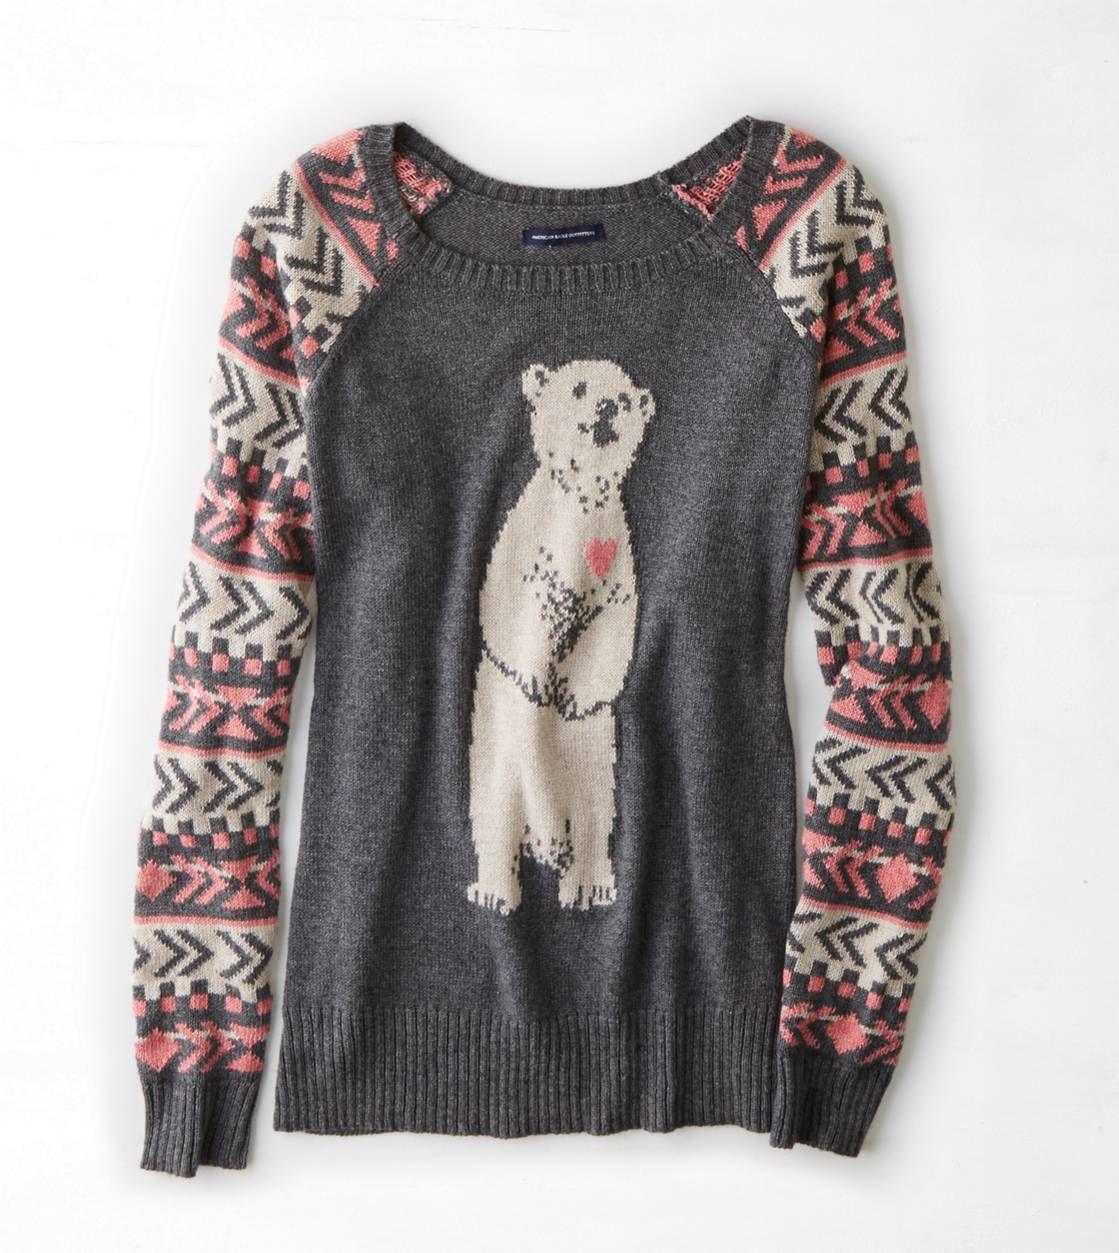 AEO Intarsia Critter Sweater. SIZE SMALL